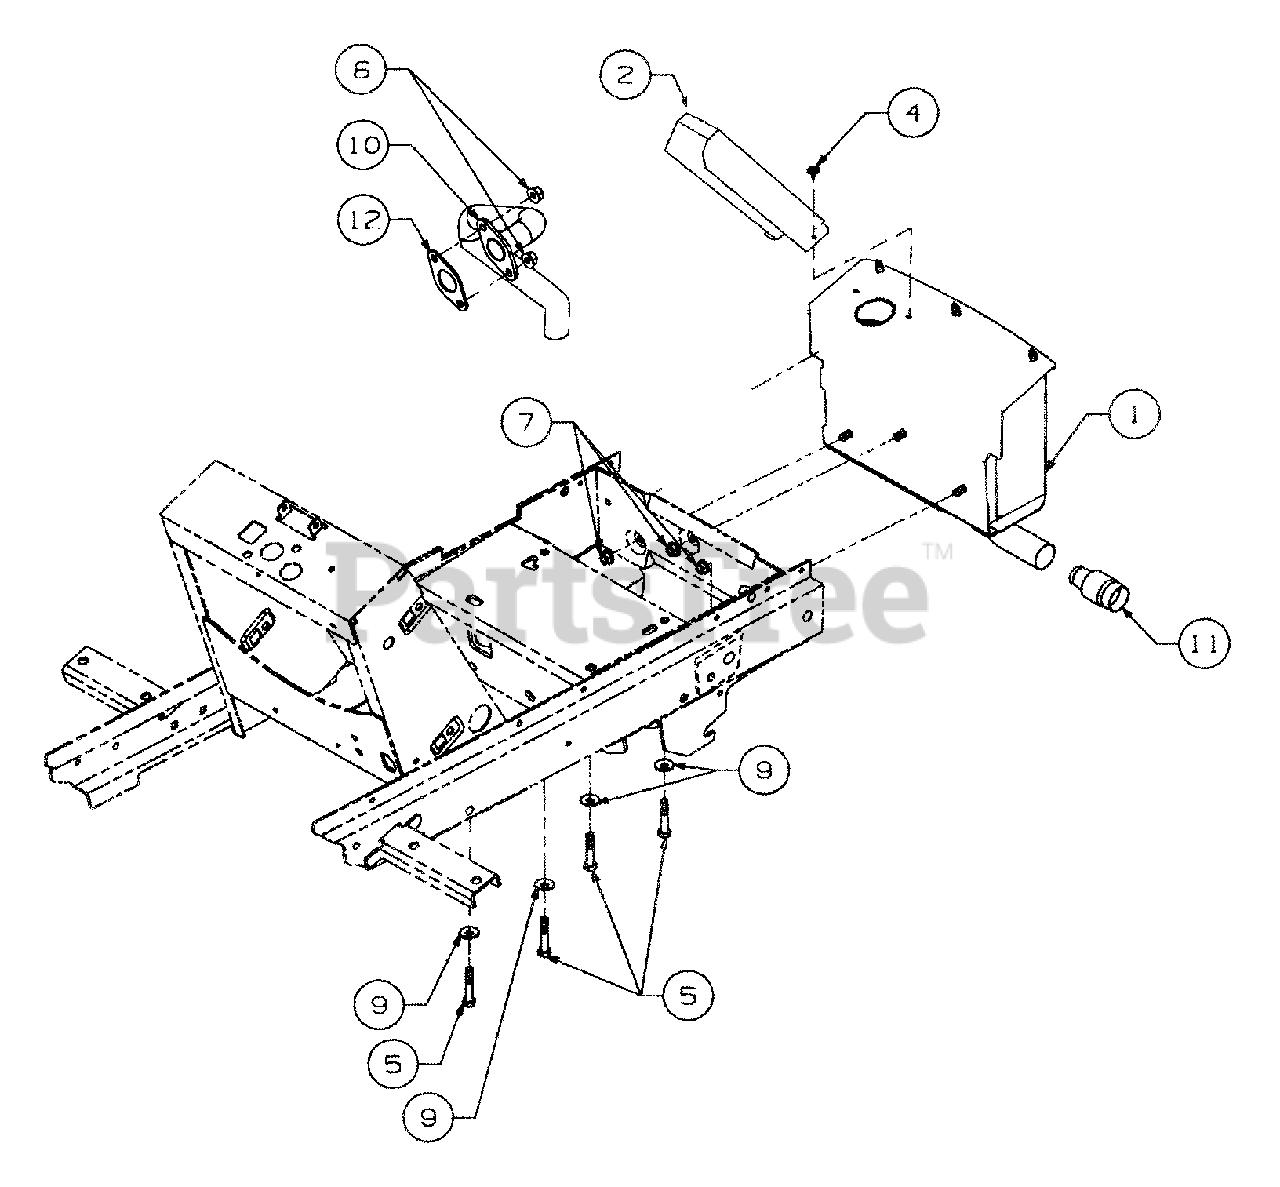 31 Cub Cadet Wiring Diagram